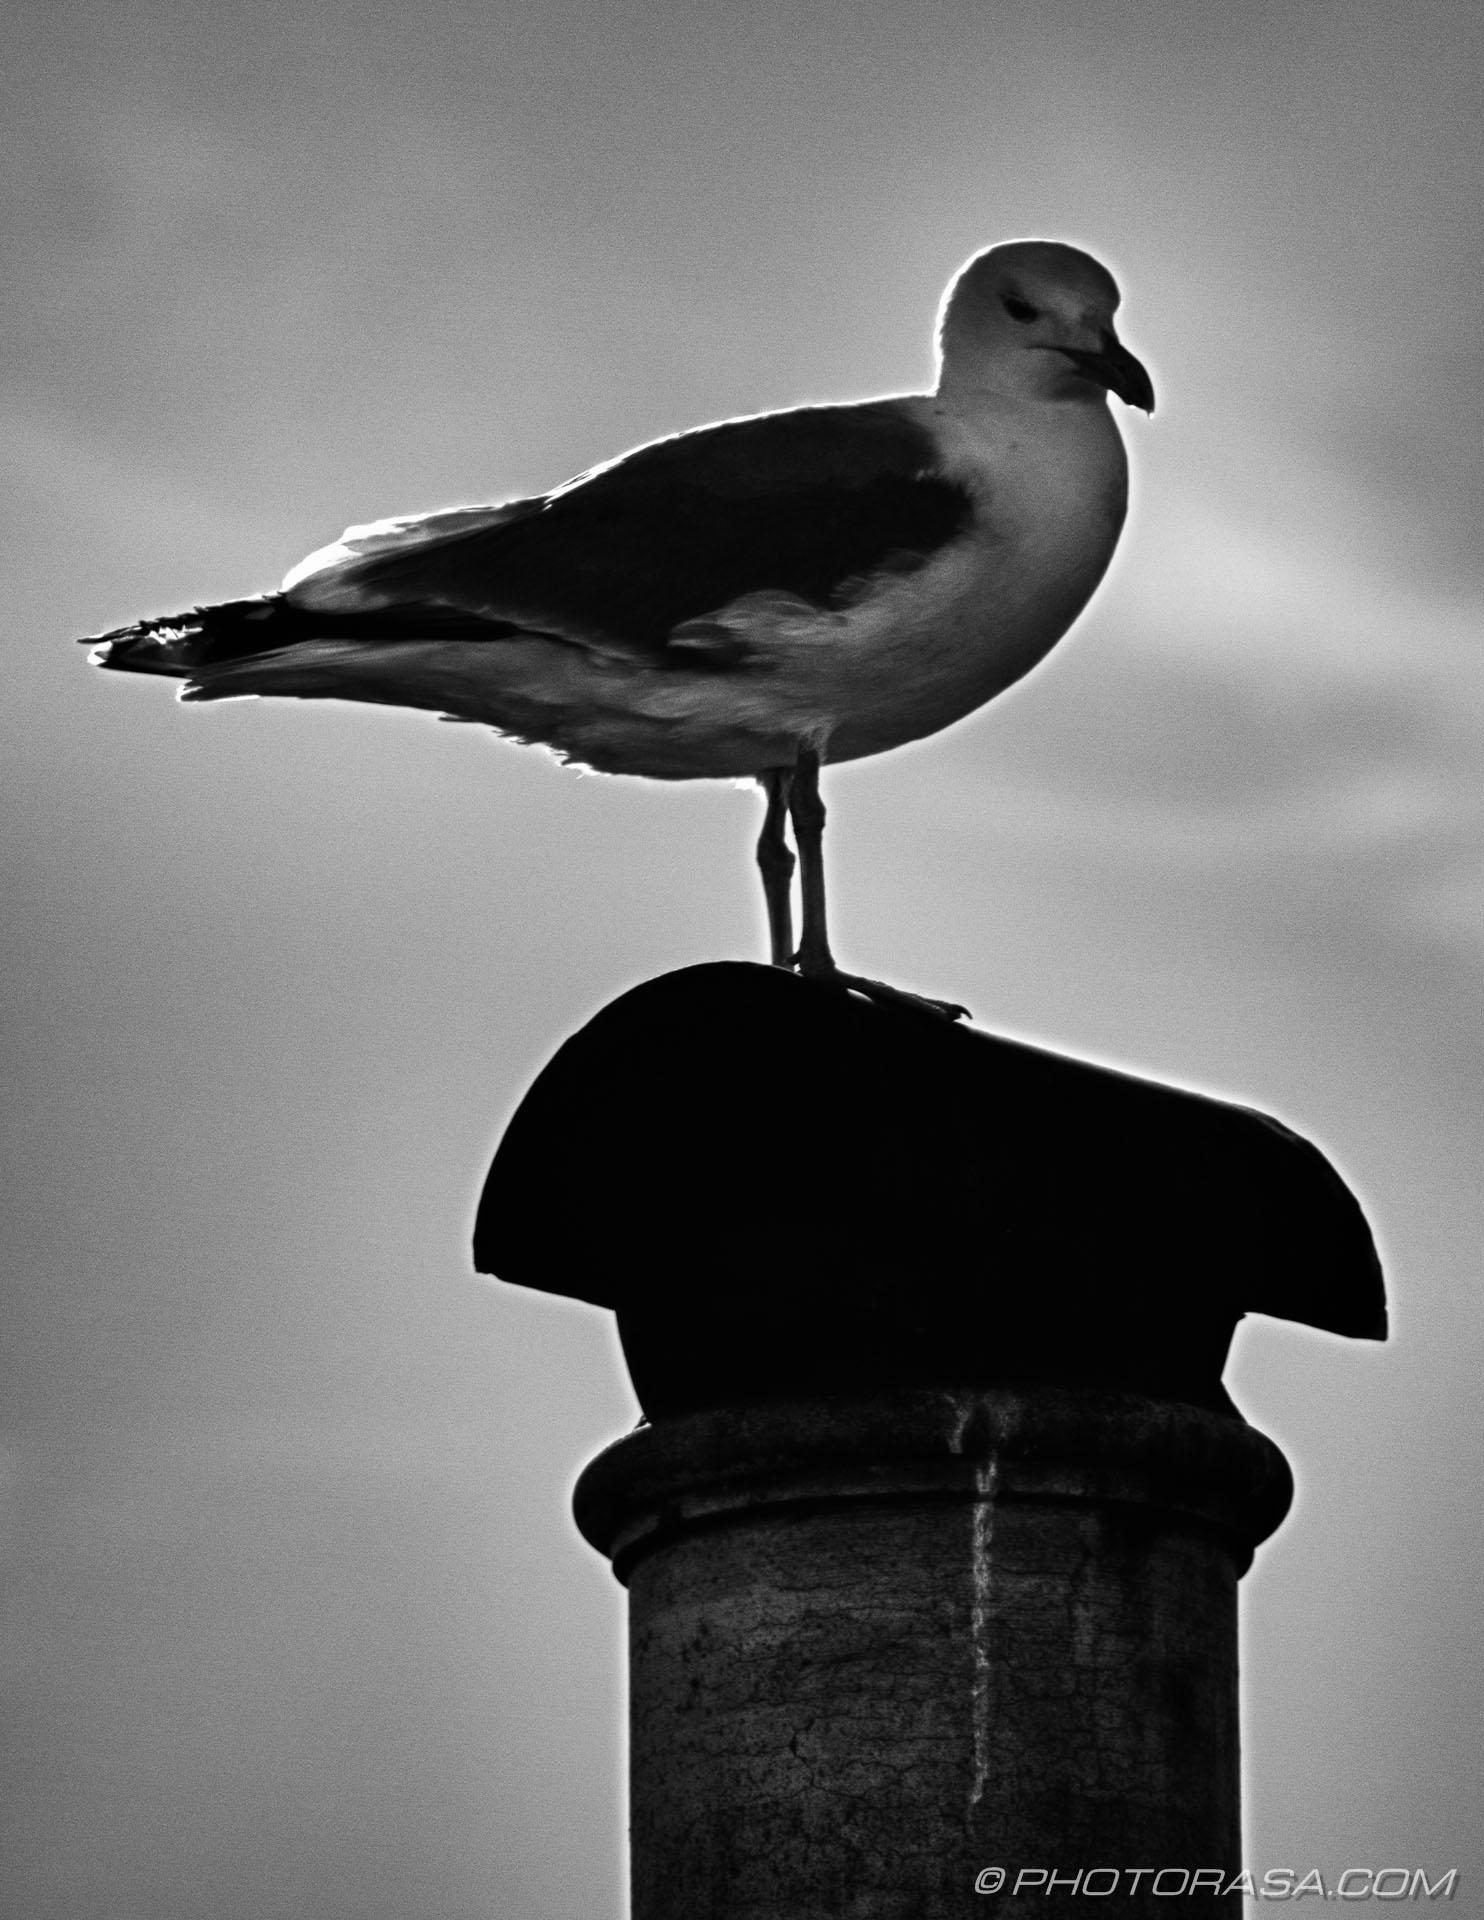 http://photorasa.com/seagulls/backlit-seagull/